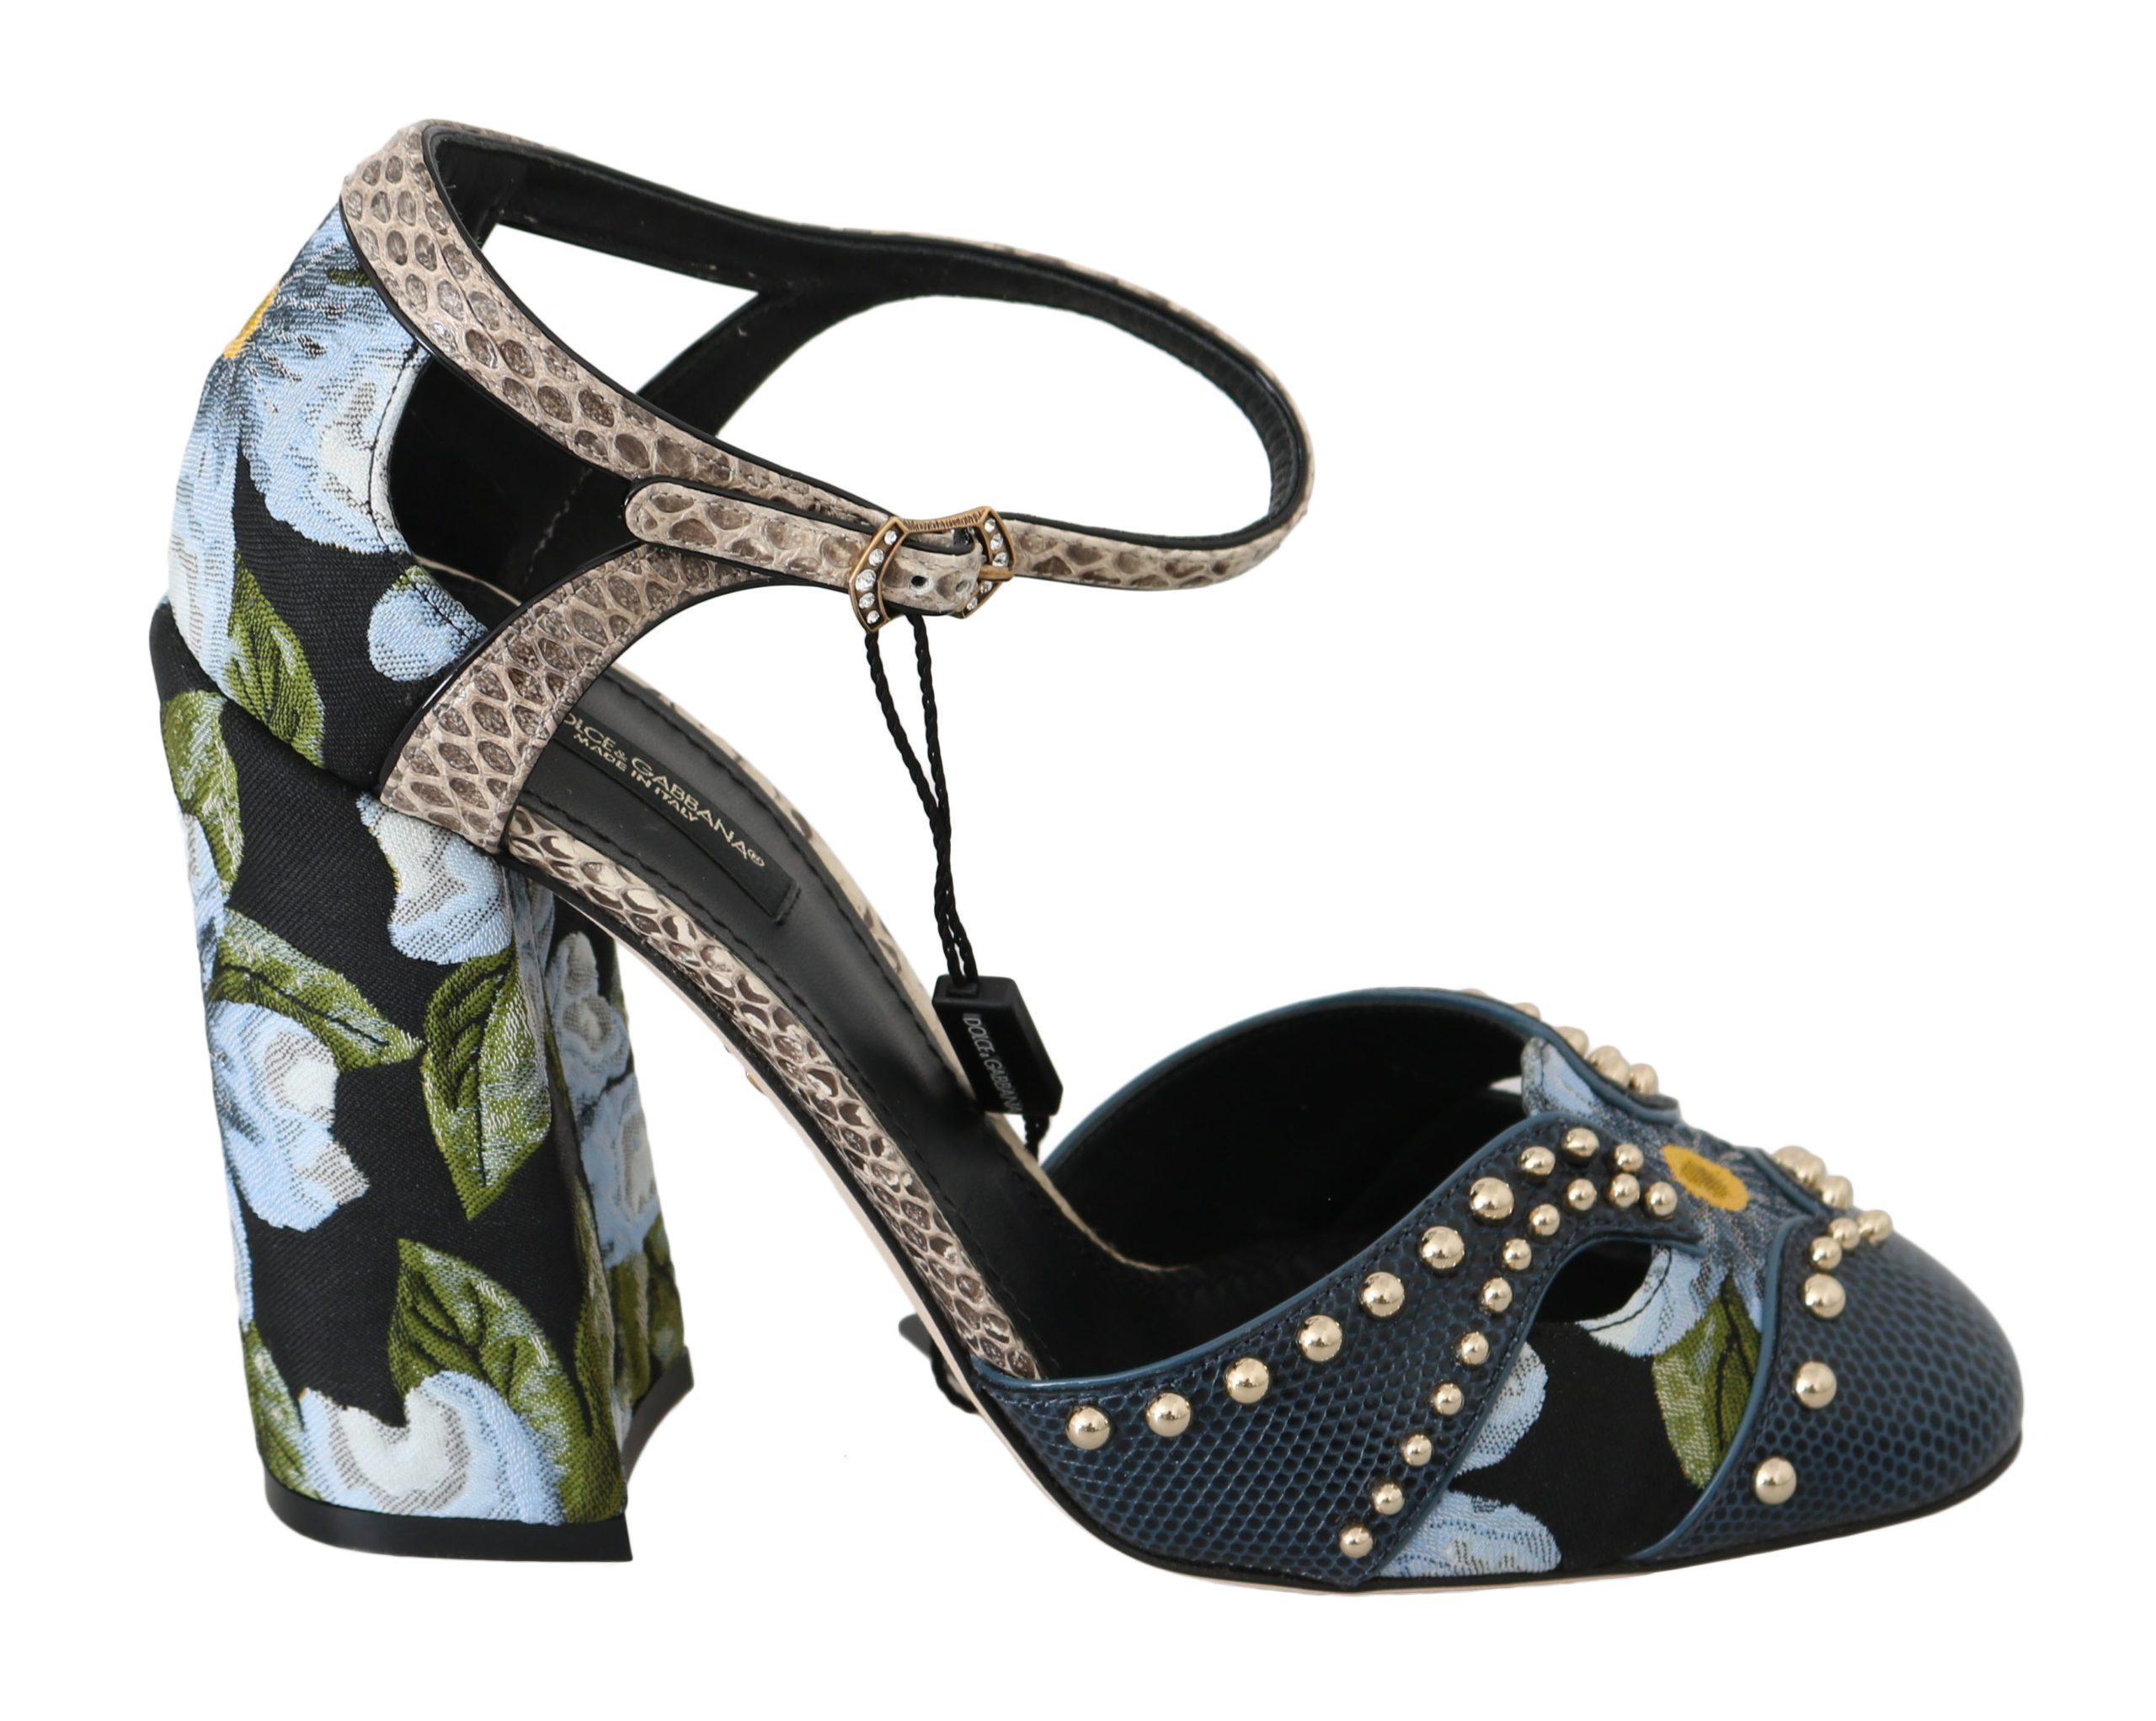 Dolce & Gabbana Women's Heels Jacquard Crystal Leather Pumps Black LA6266 - EU36/US5.5